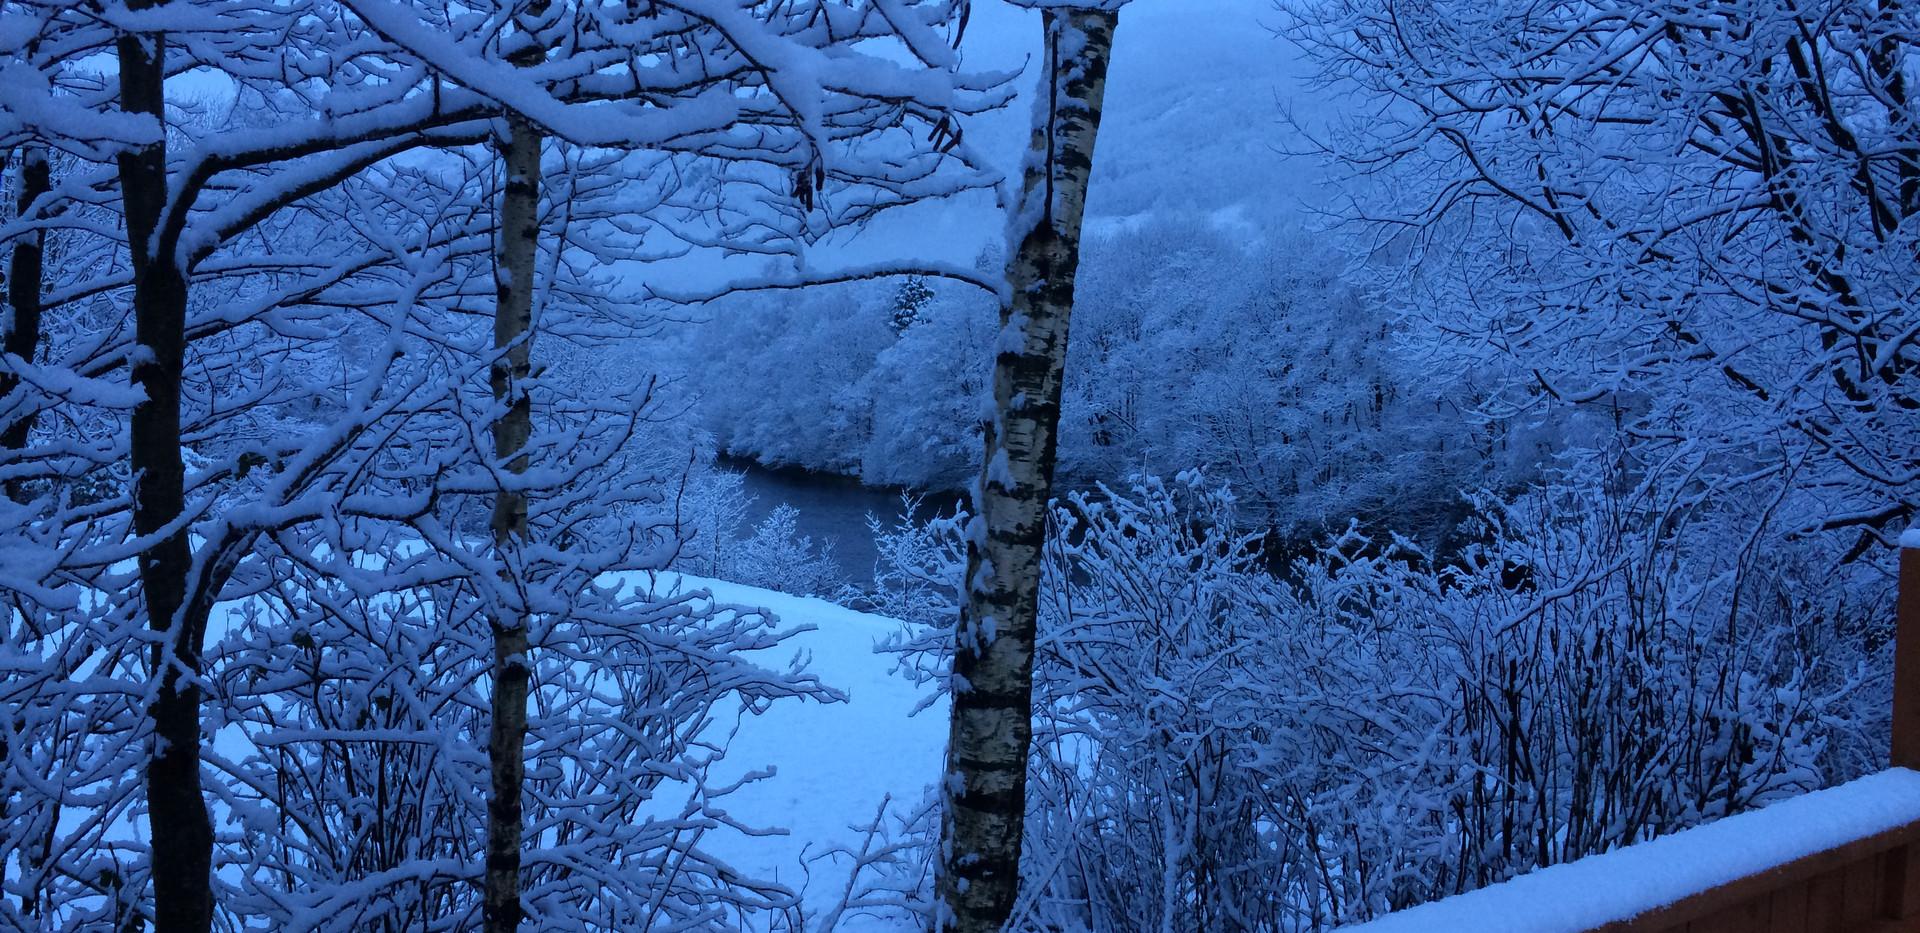 WHWH Nevis Pod snowy view 2 Jan 2019.JPG